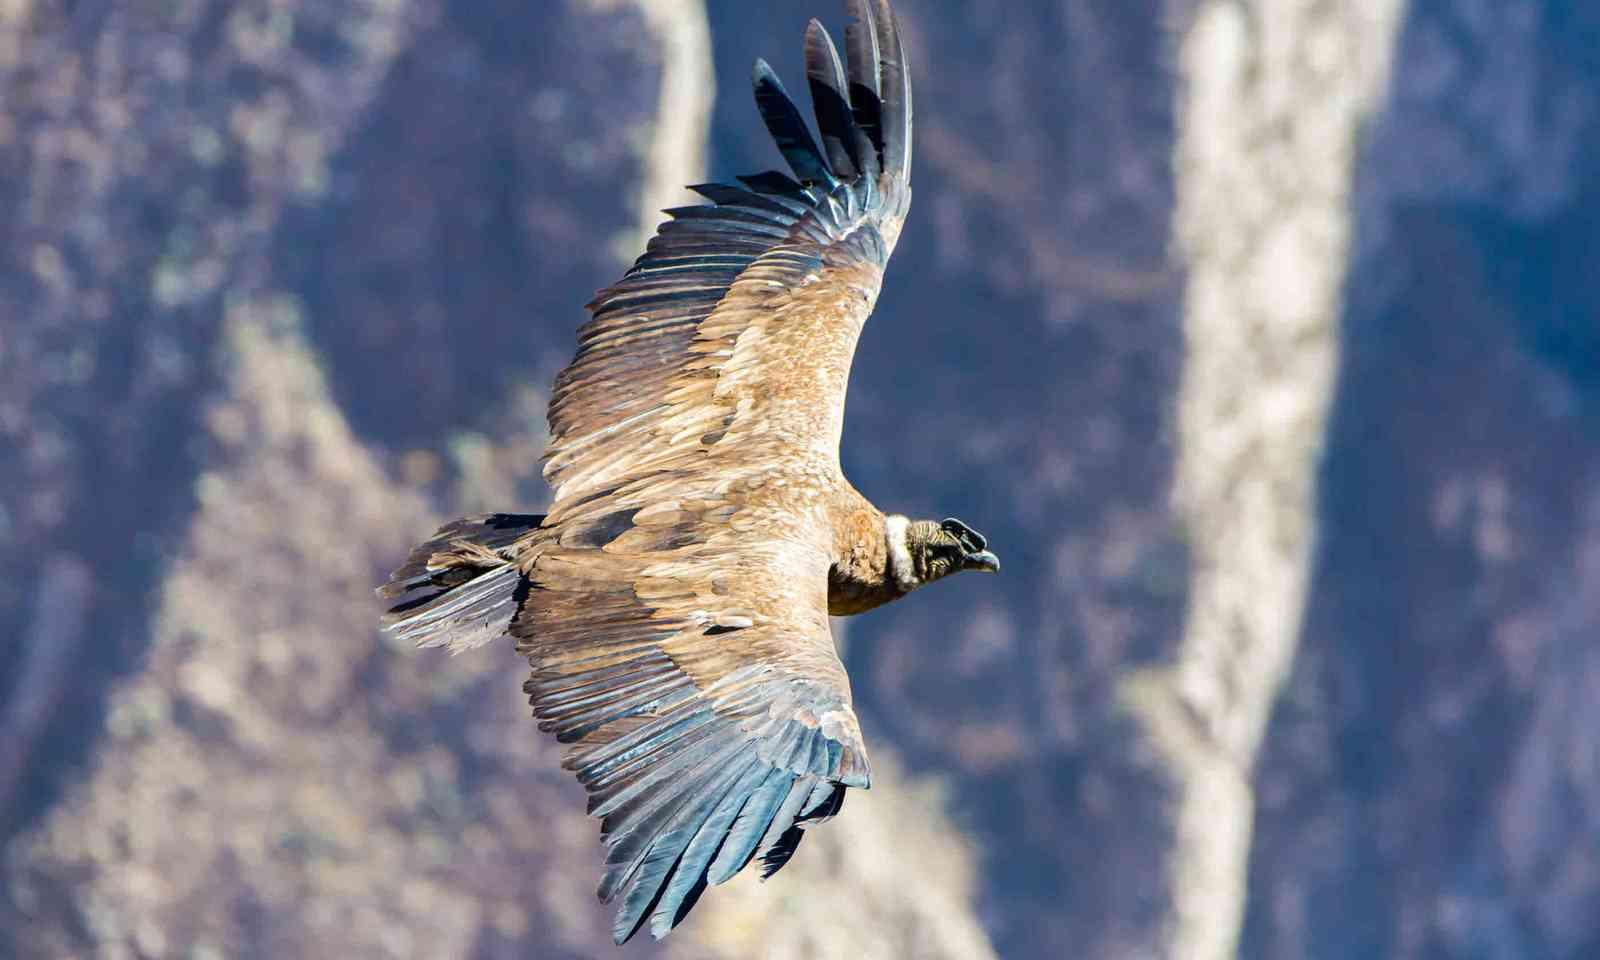 Flying condor over Colca canyon, Peru (Shutterstock)